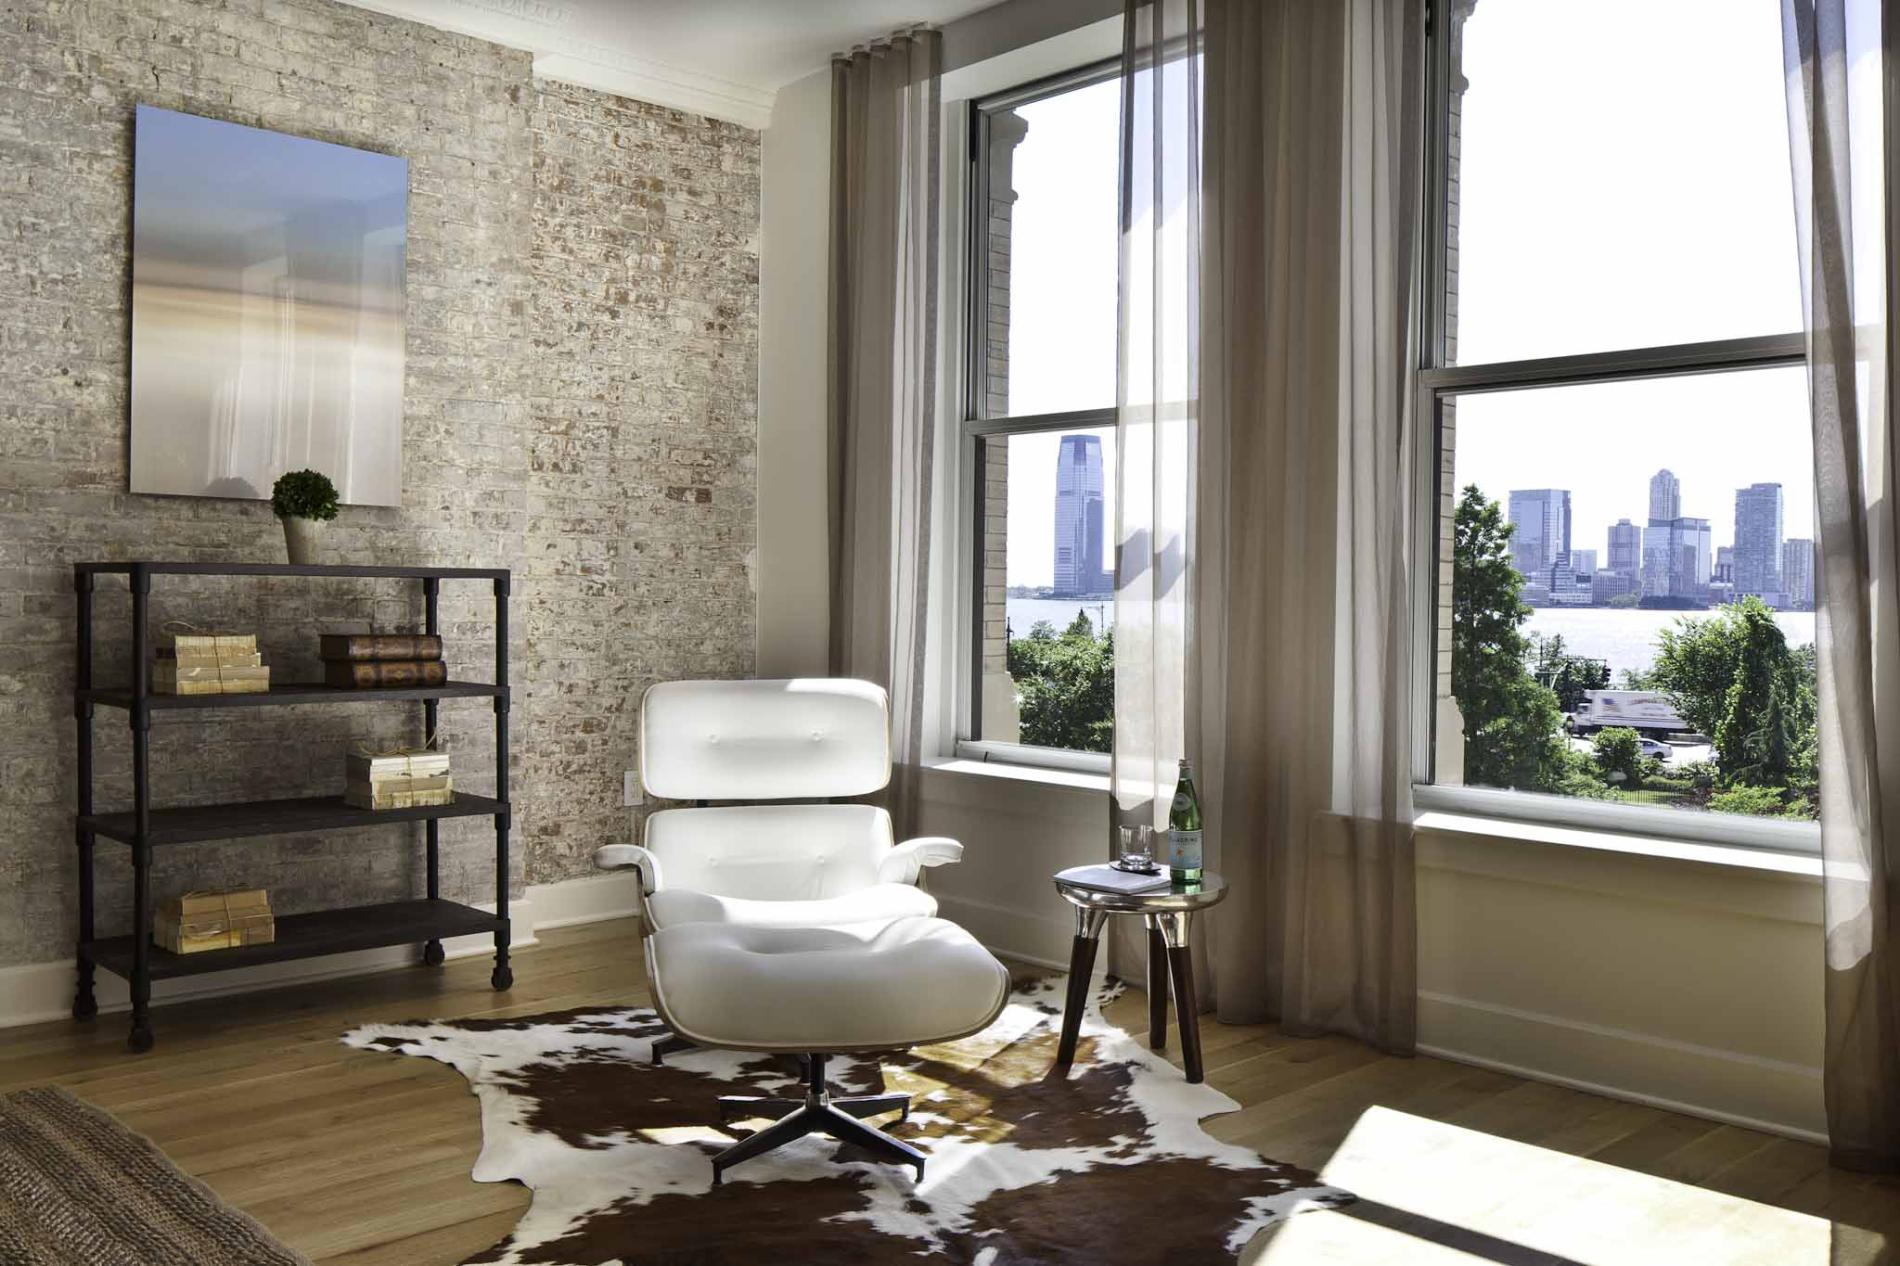 loft window coverings minimalistic design spice warehouse living room 55736 1900 jpg